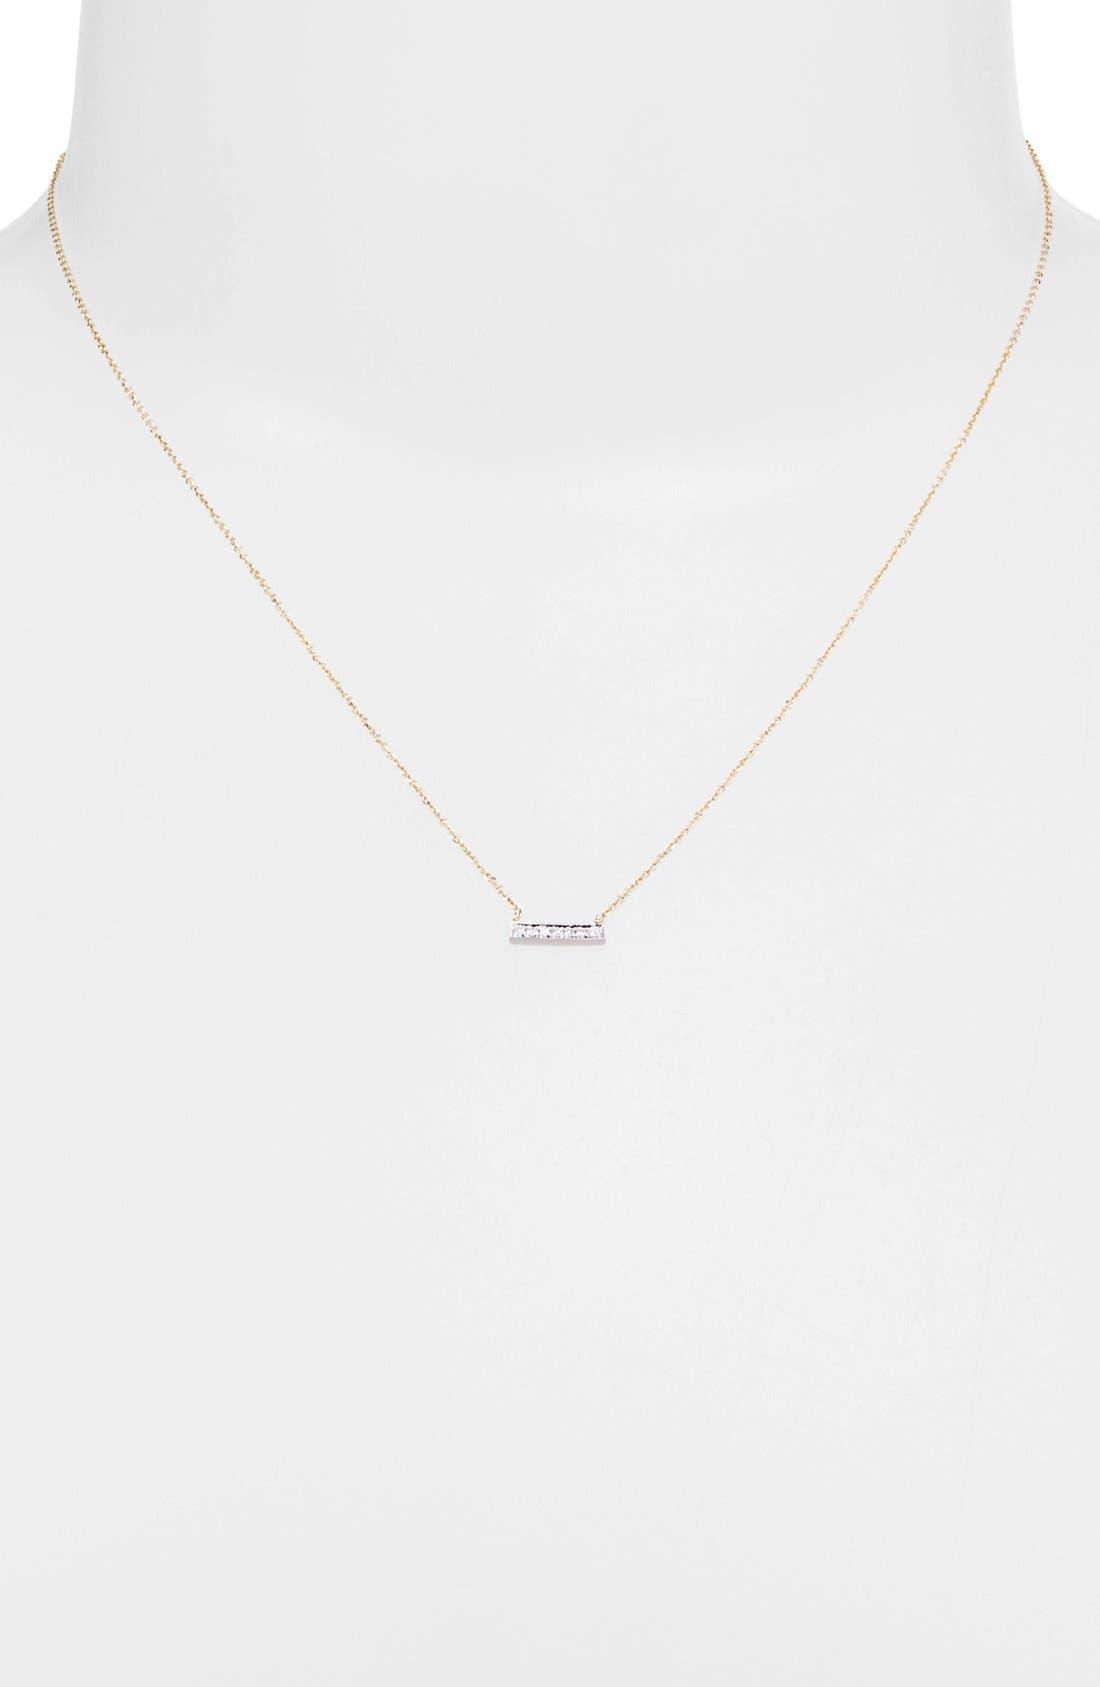 DANA REBECCA DESIGNS, 'Sylvie Rose' Diamond Bar Pendant Necklace, Alternate thumbnail 8, color, YELLOW GOLD